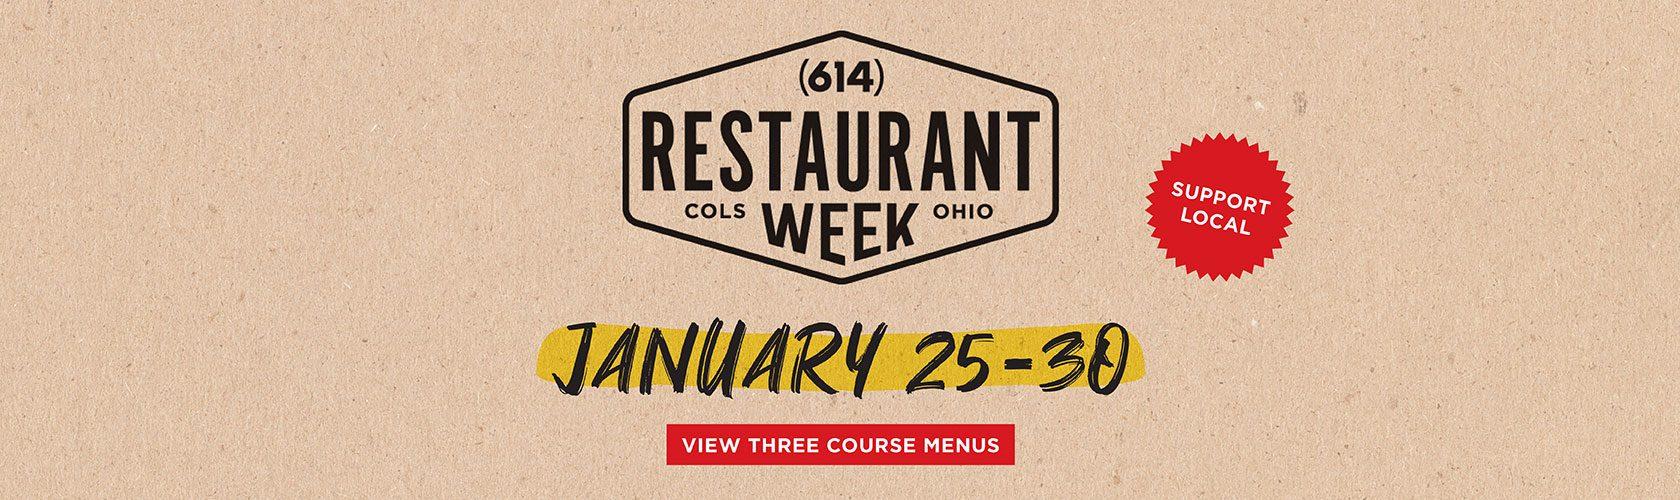 (614) Restaurant Week January 25-30, 2021. View three course menus